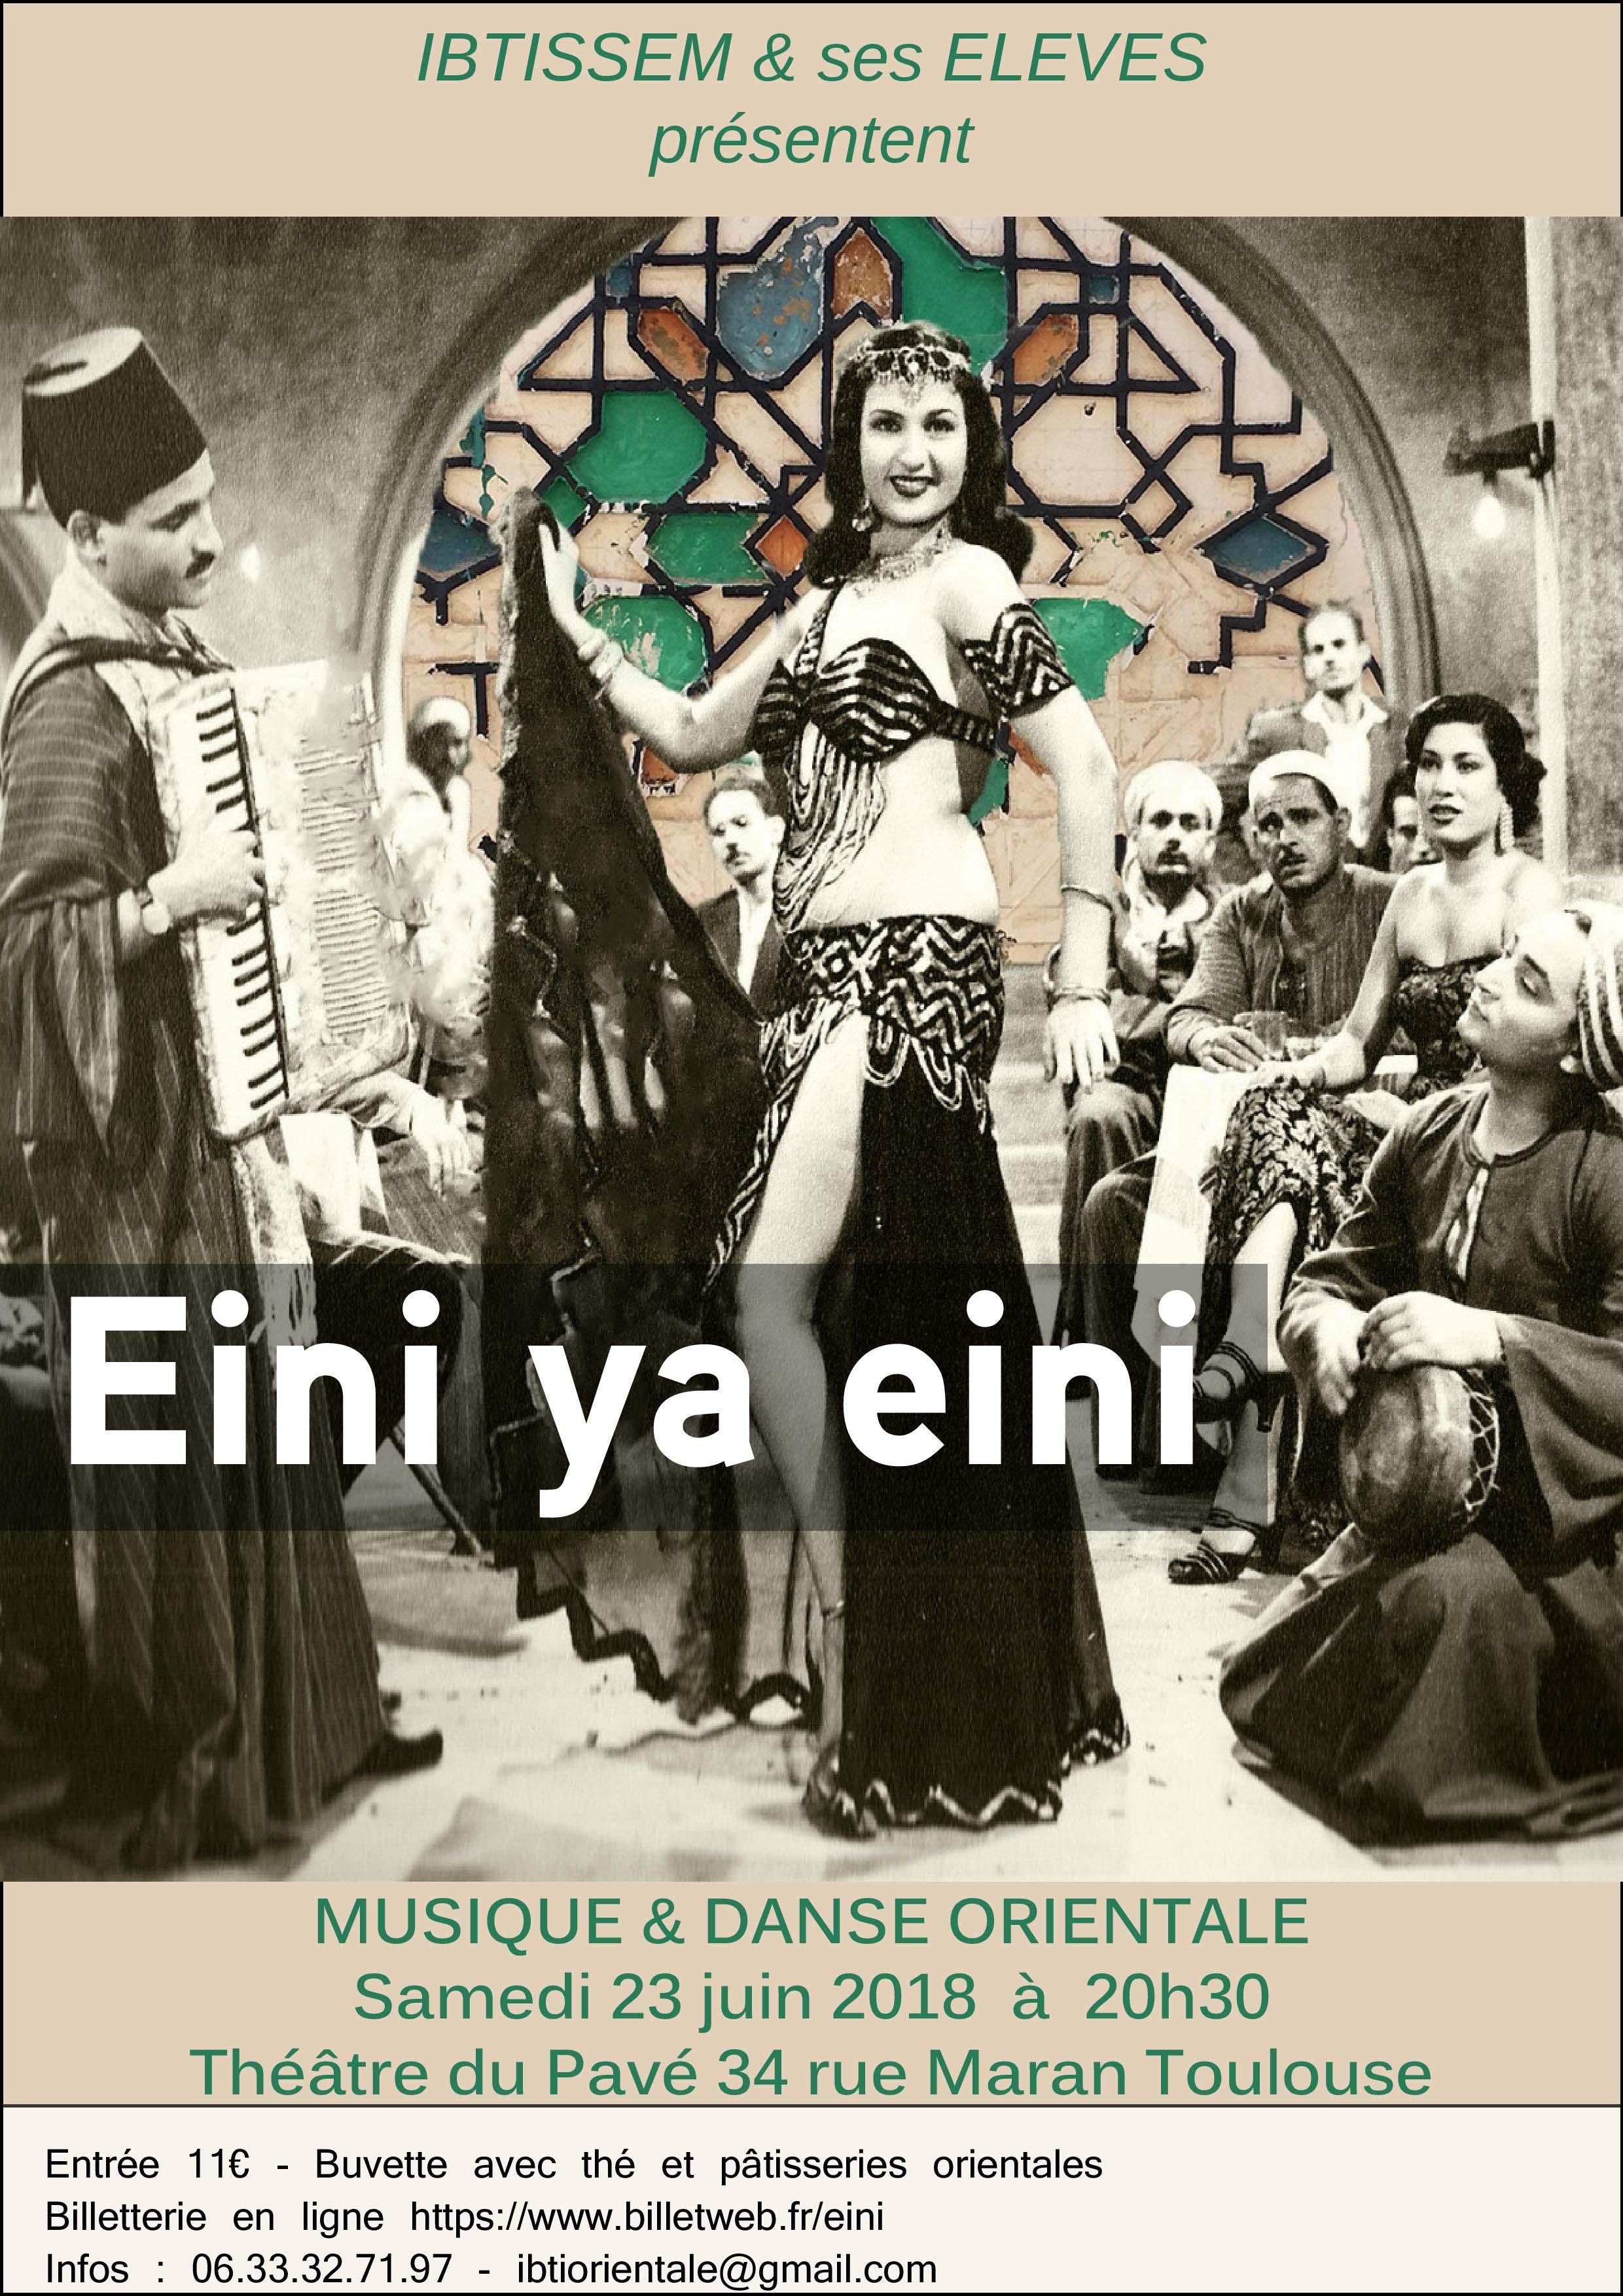 Spectacle de danse orientale